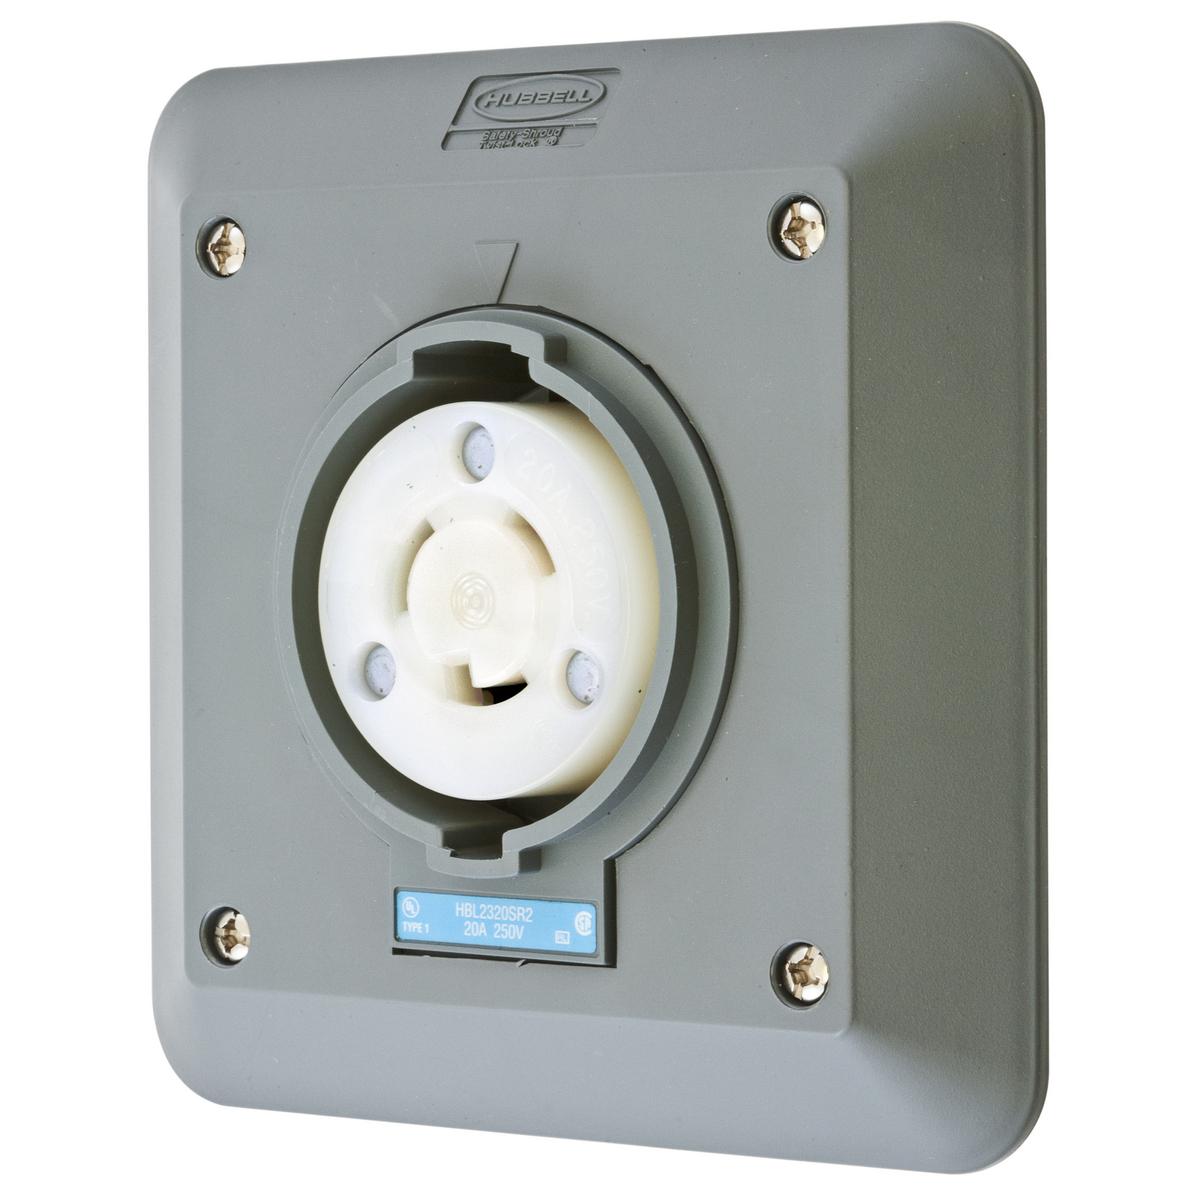 Wiring Nema Plug Chart Likewise Hubbell Twist Lock Plug Wiring Diagram